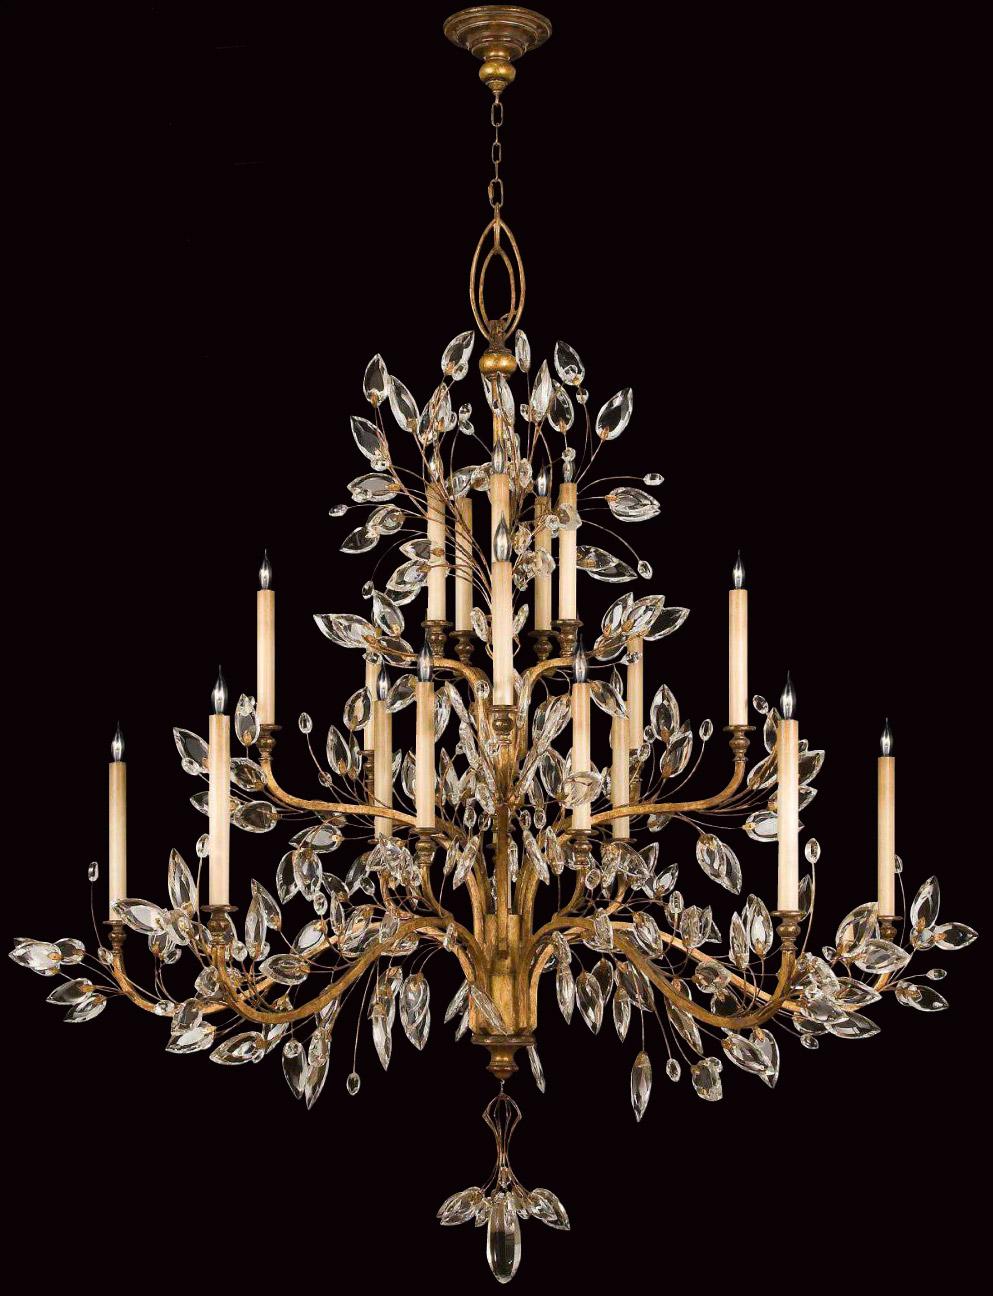 Fine art lamps 774540 crystal crystal laurel gold grand chandelier aloadofball Gallery